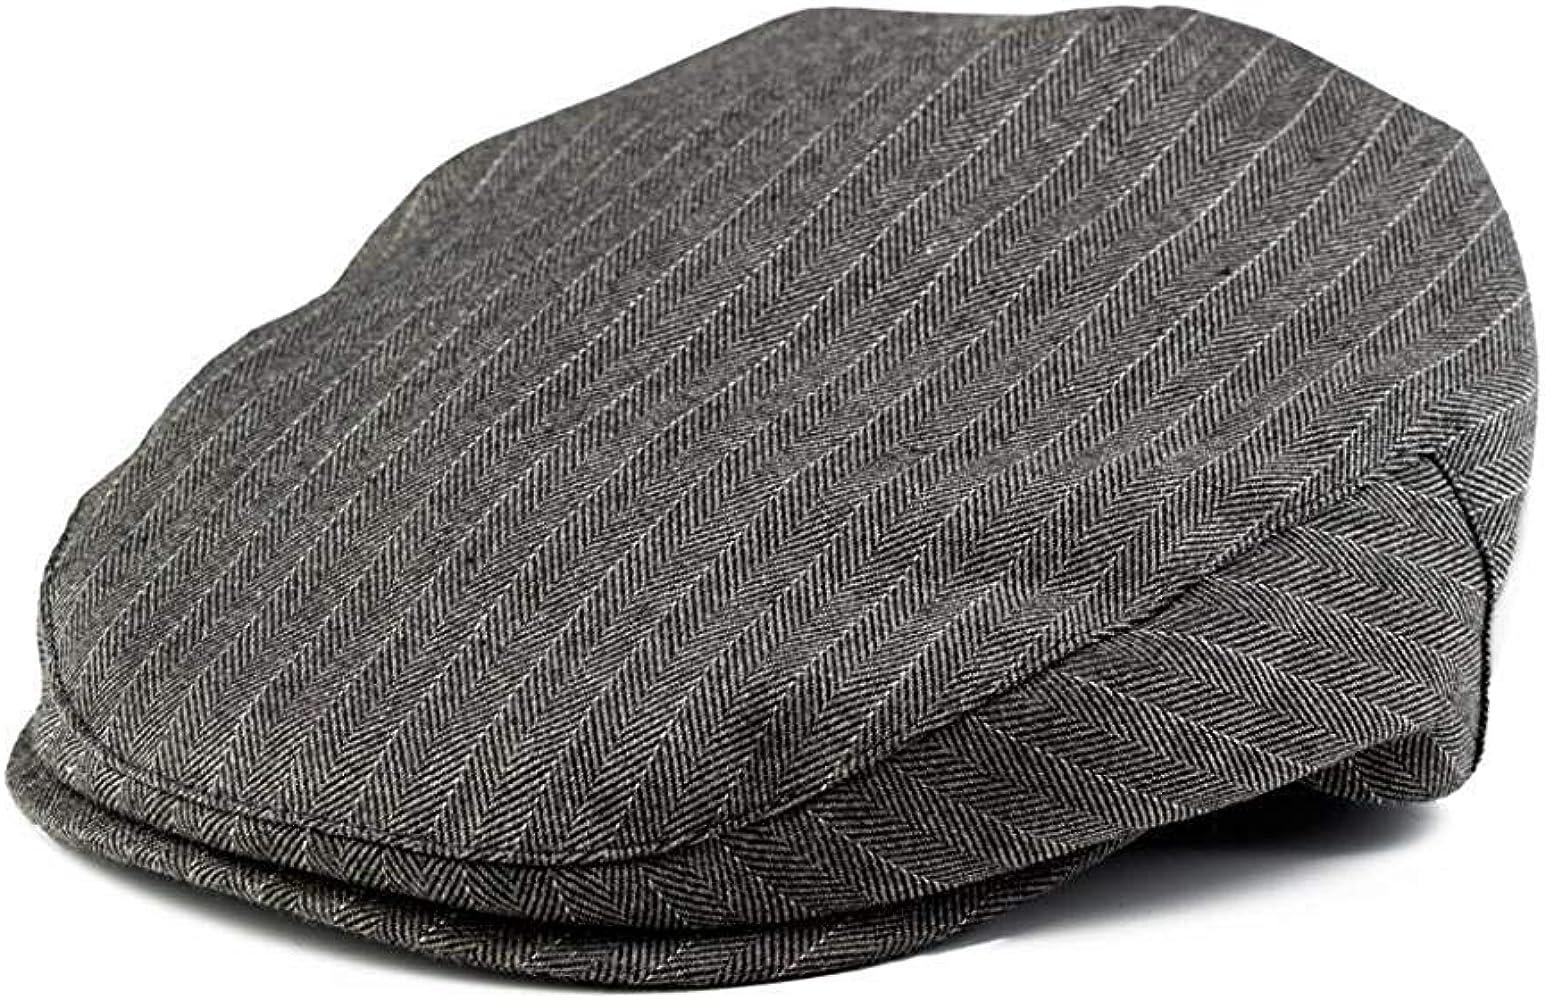 6f3544e08 Infant & Toddler Boys Pinstripe Driver Cap Baby Hat for Kids